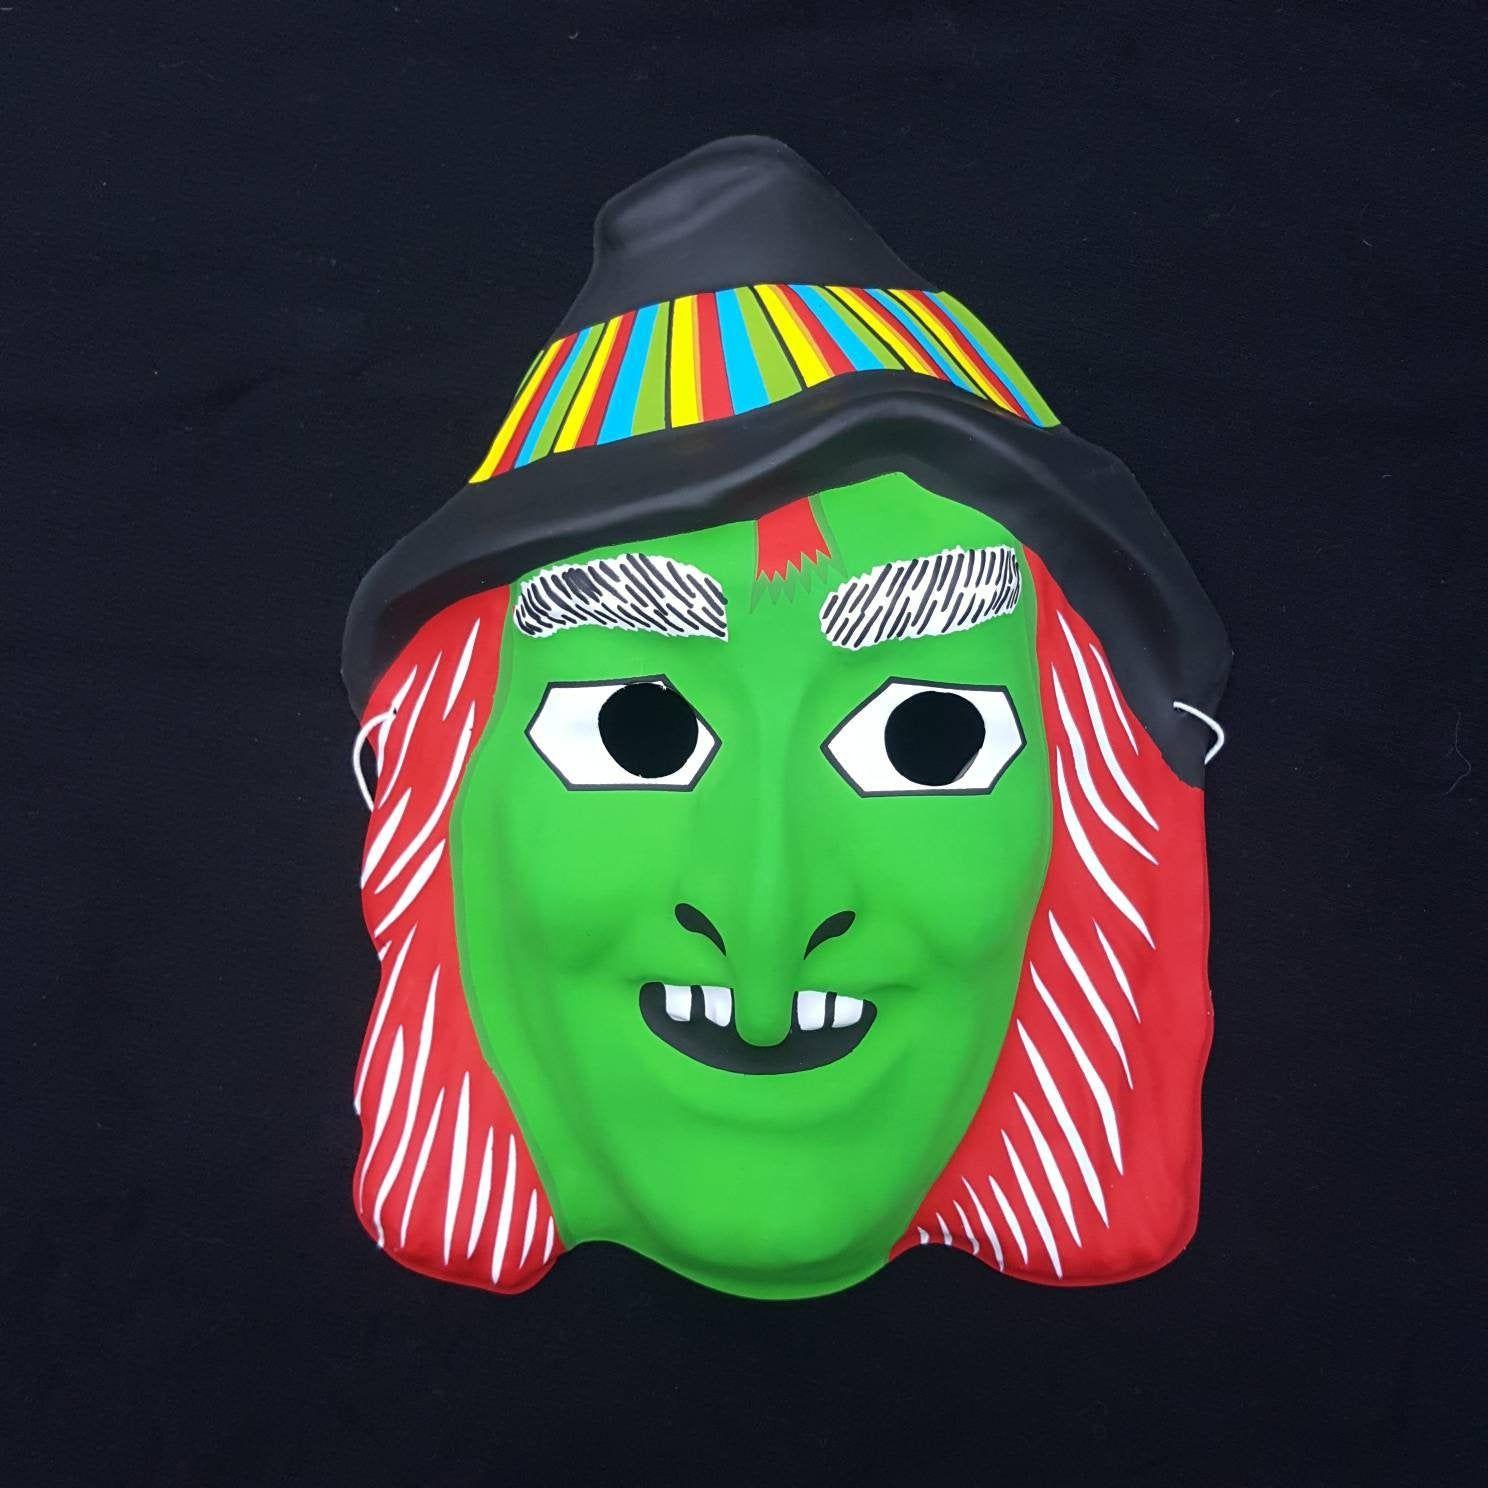 Vintage 1990s Plastic Green Cartoon Witch Mask Cartoon